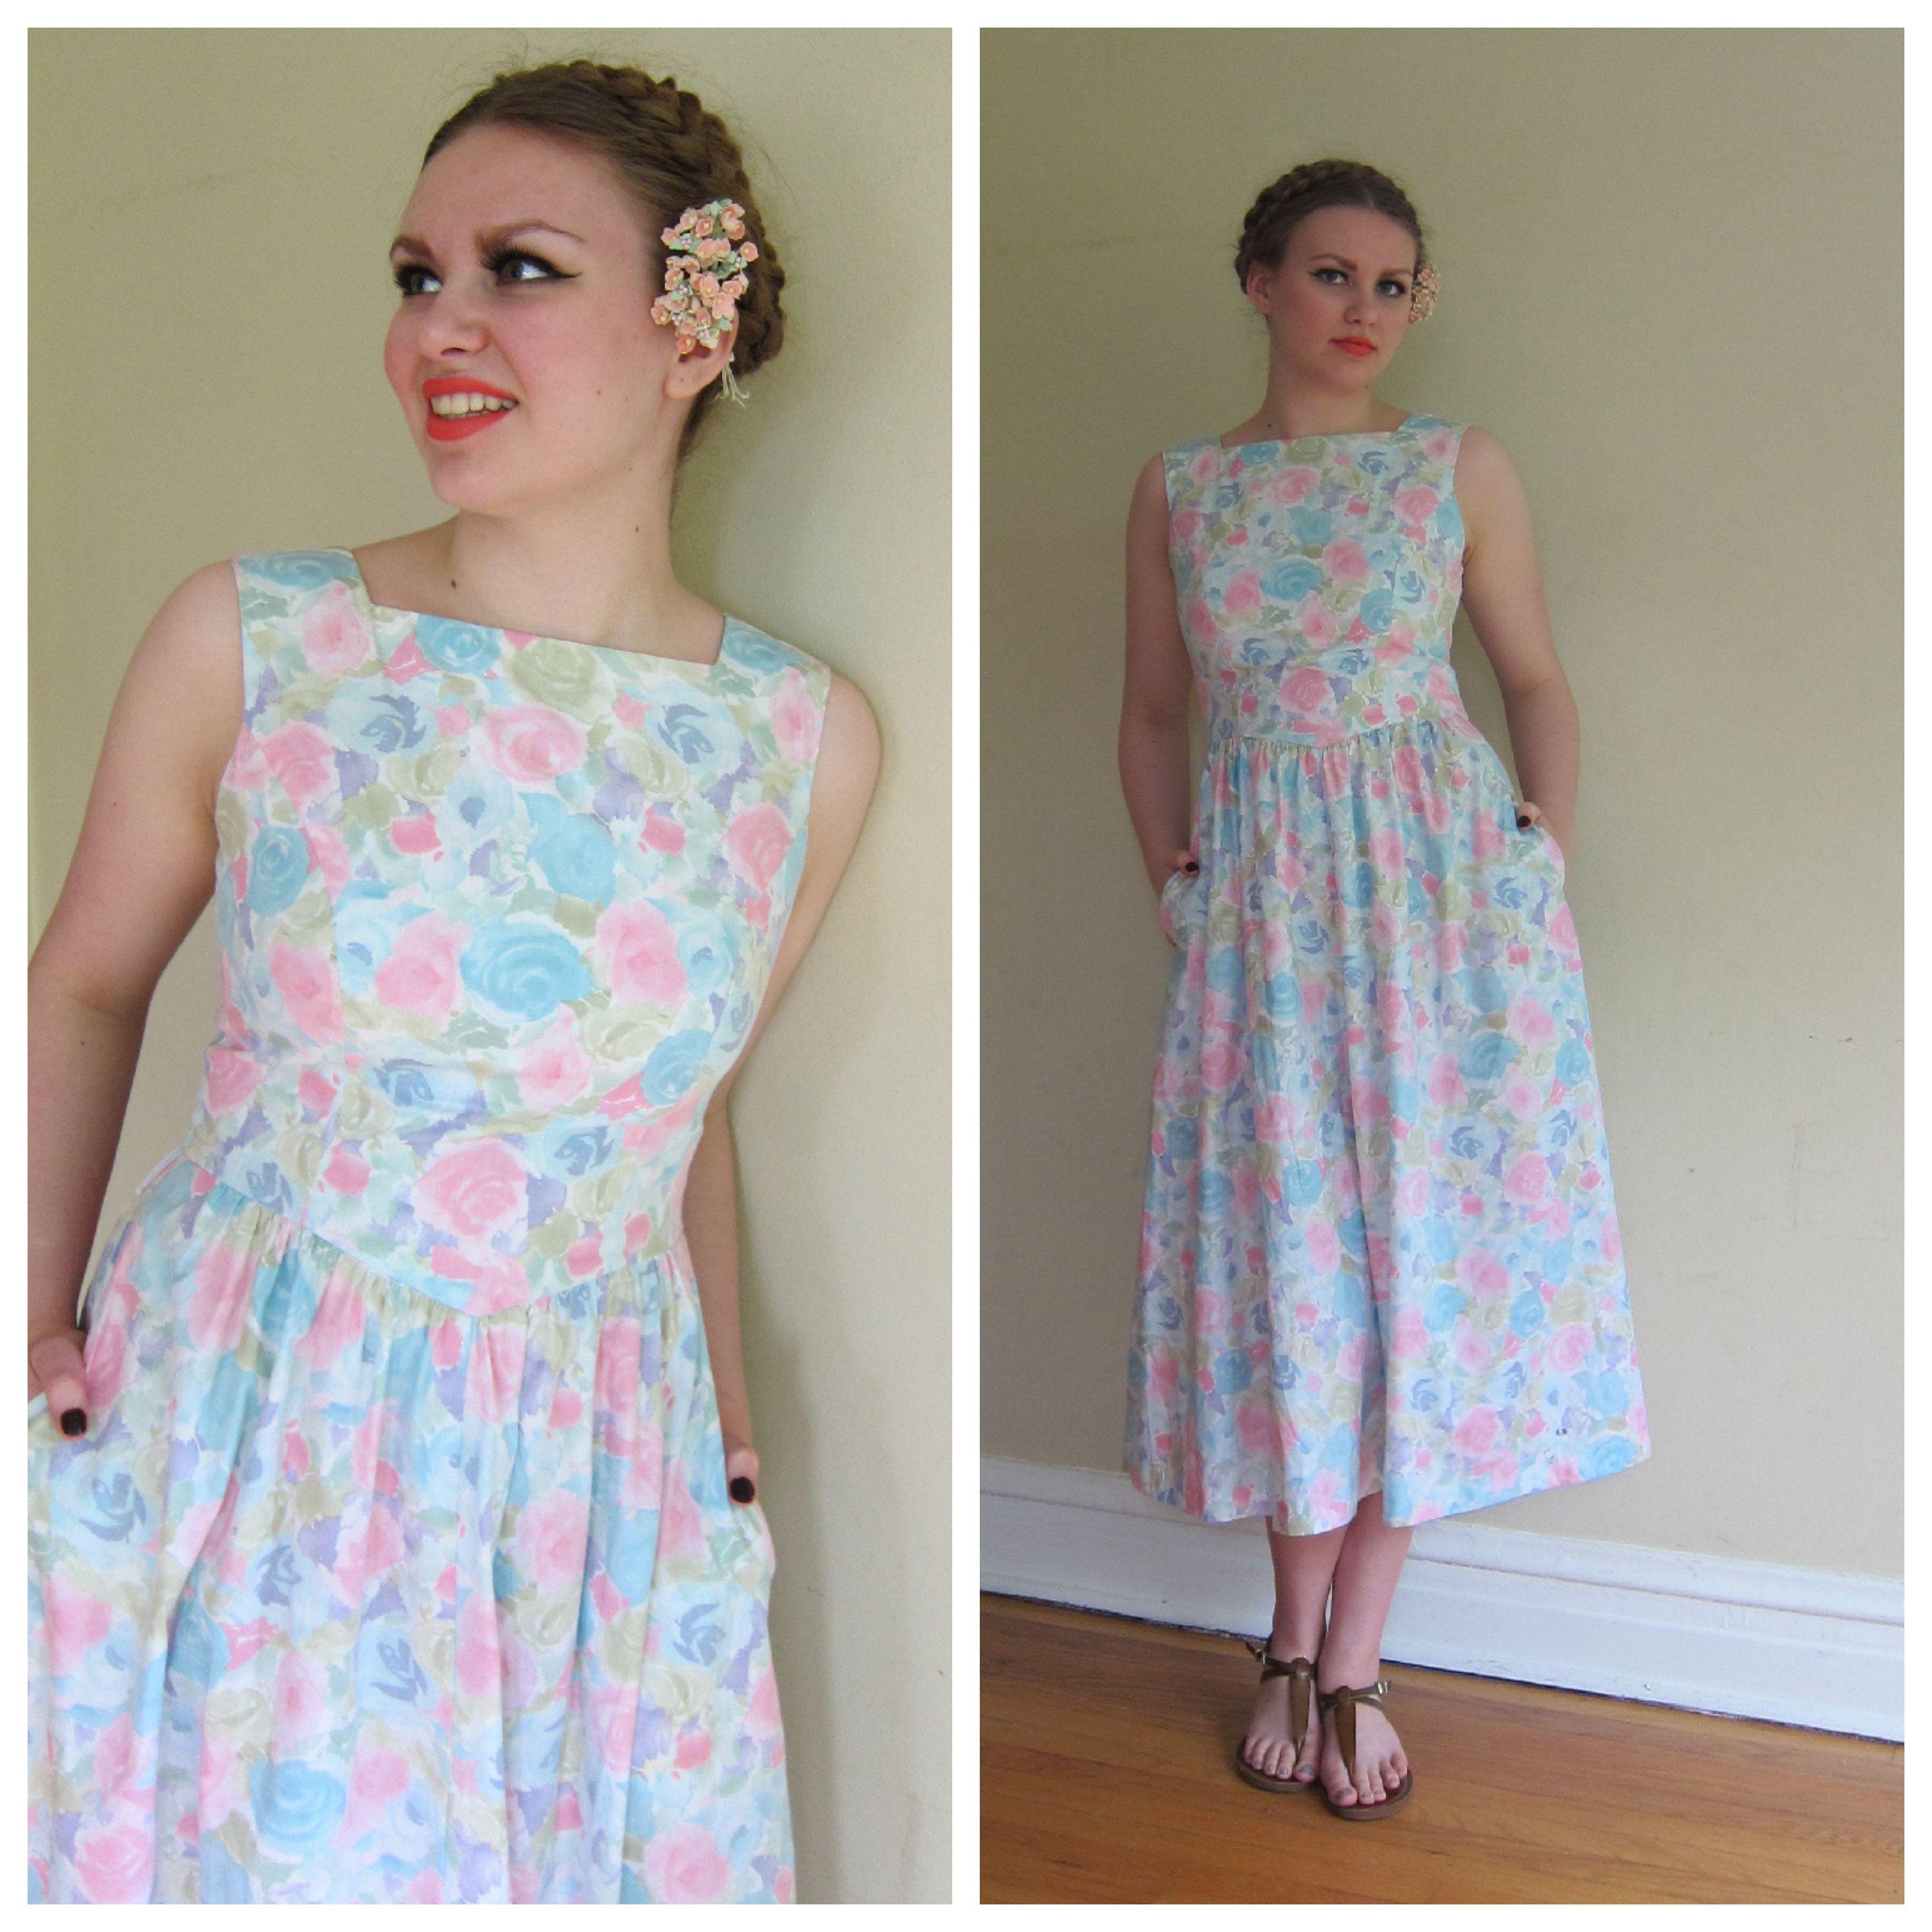 f89d17a1694f 1980s Dress / 80s Floral Print Dress / Lanz Sundress in Pastel Cotton Print  / Sleeveless Summer Dress Midi Length / Med by BasyaBerkman on Etsy